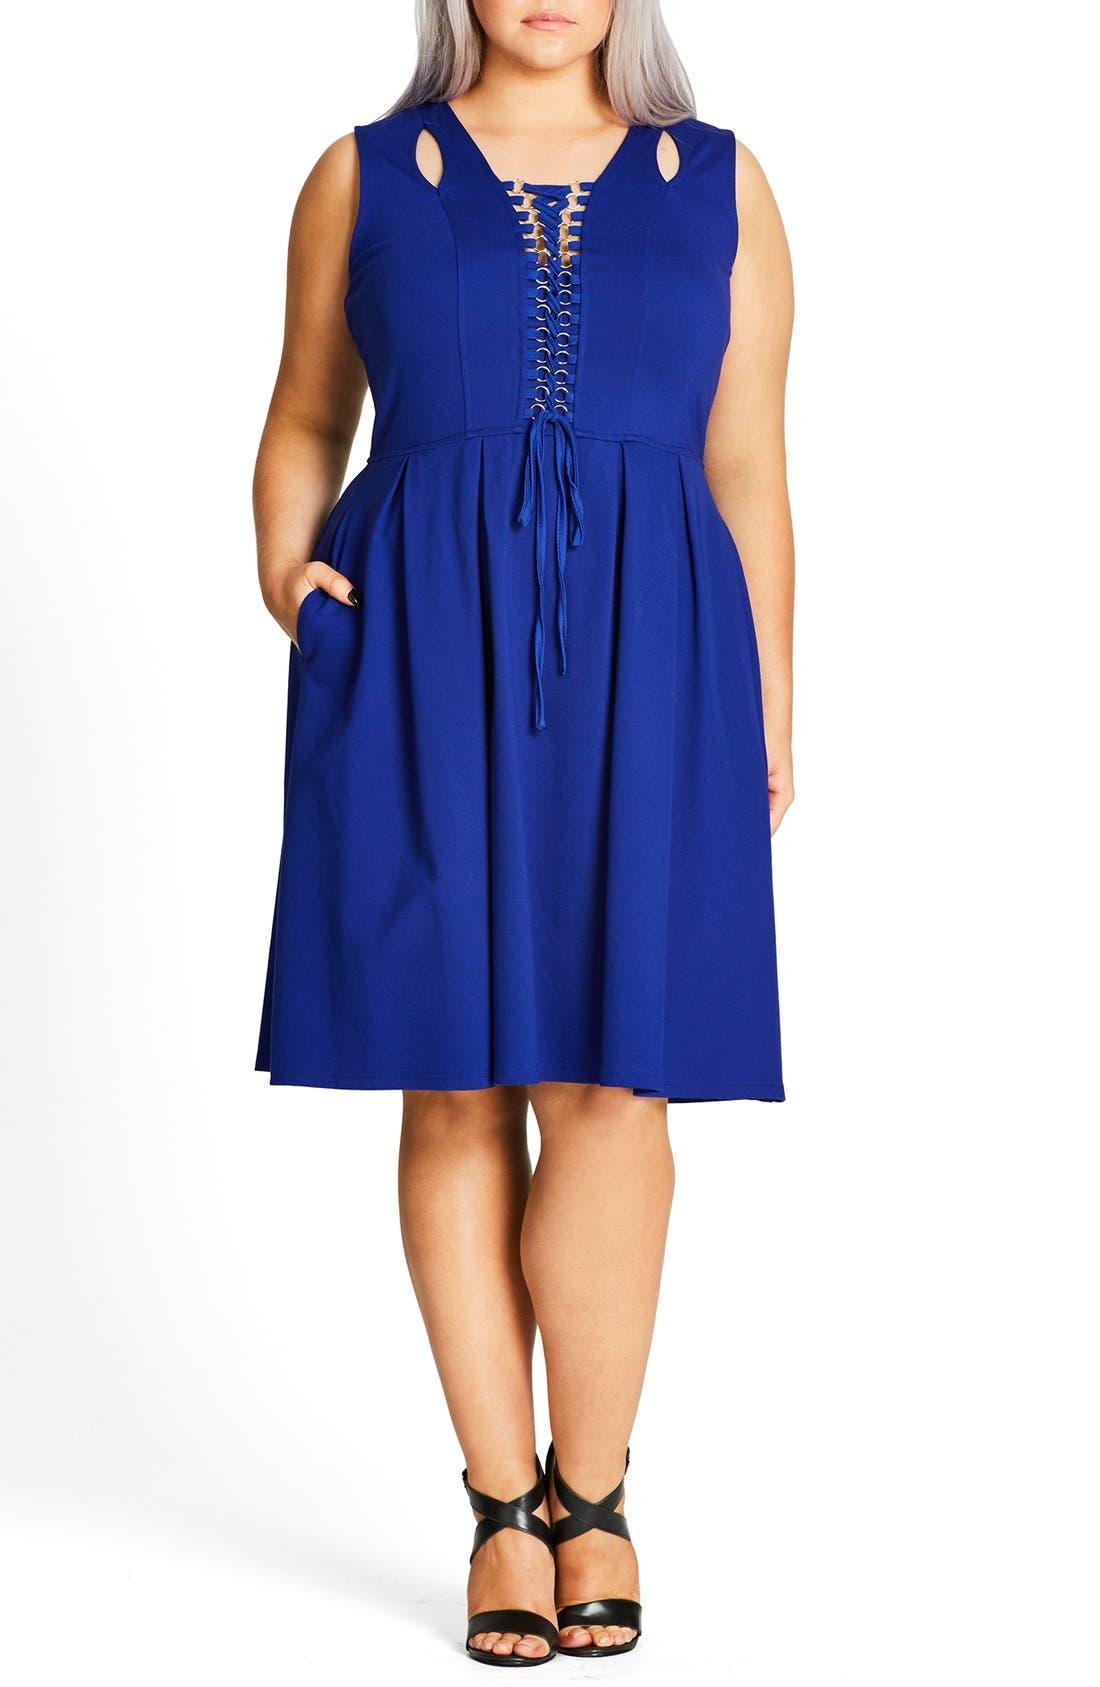 Main Image - City Chic Lace-Up Fit & Flare Dress (Plus Size)